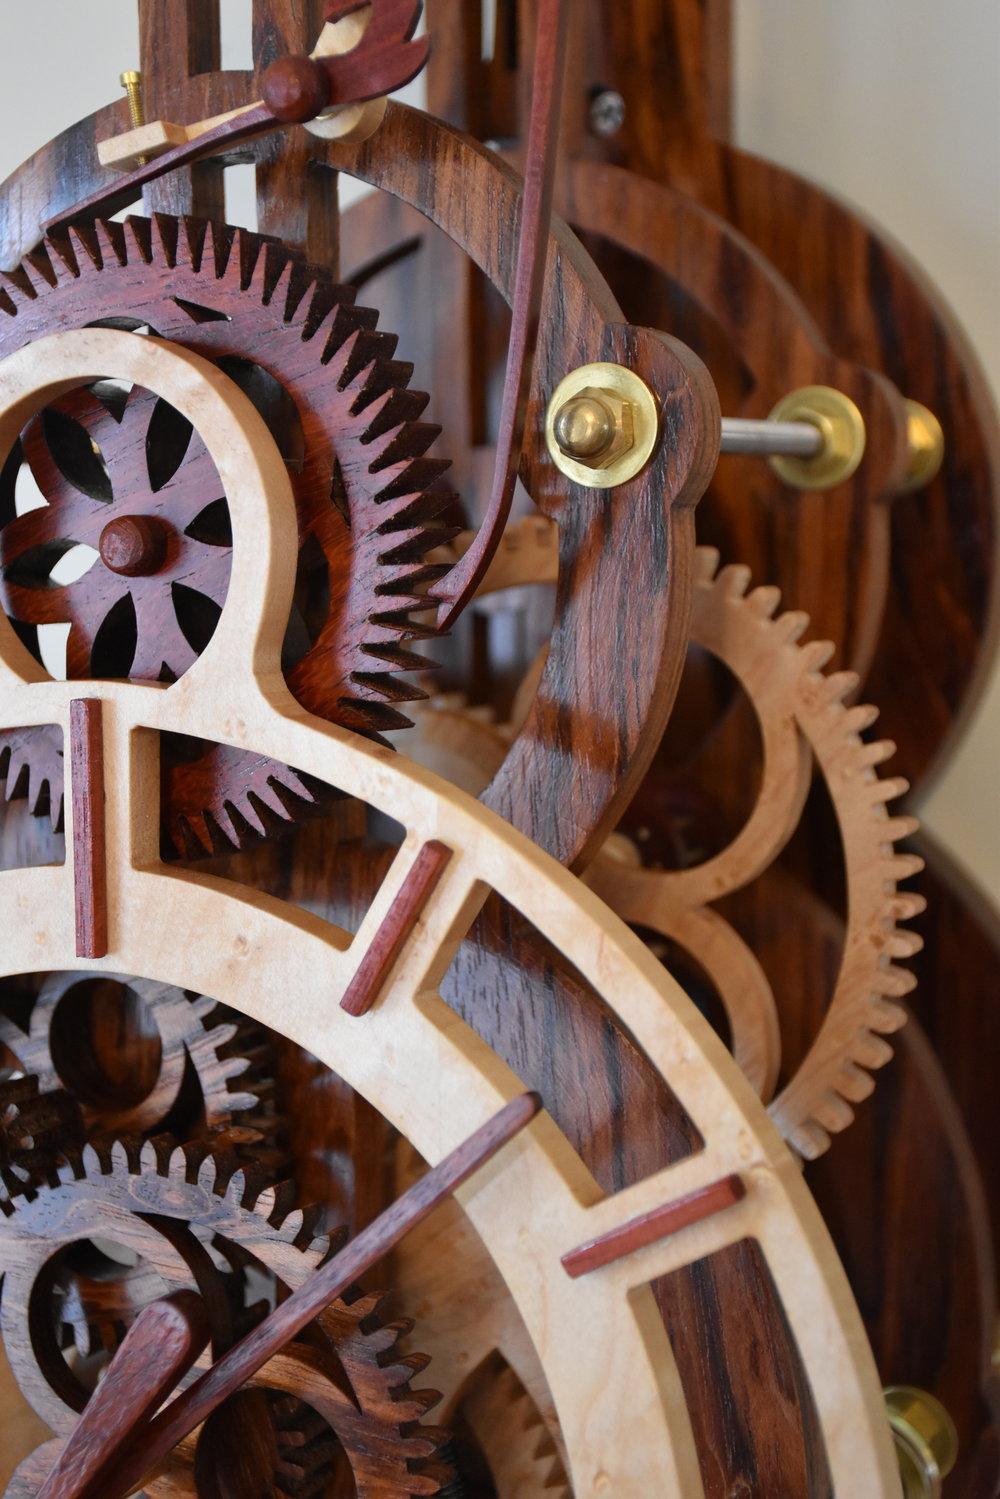 R9 - 8 Day Clock with Grasshopper EscapementThis original design features a